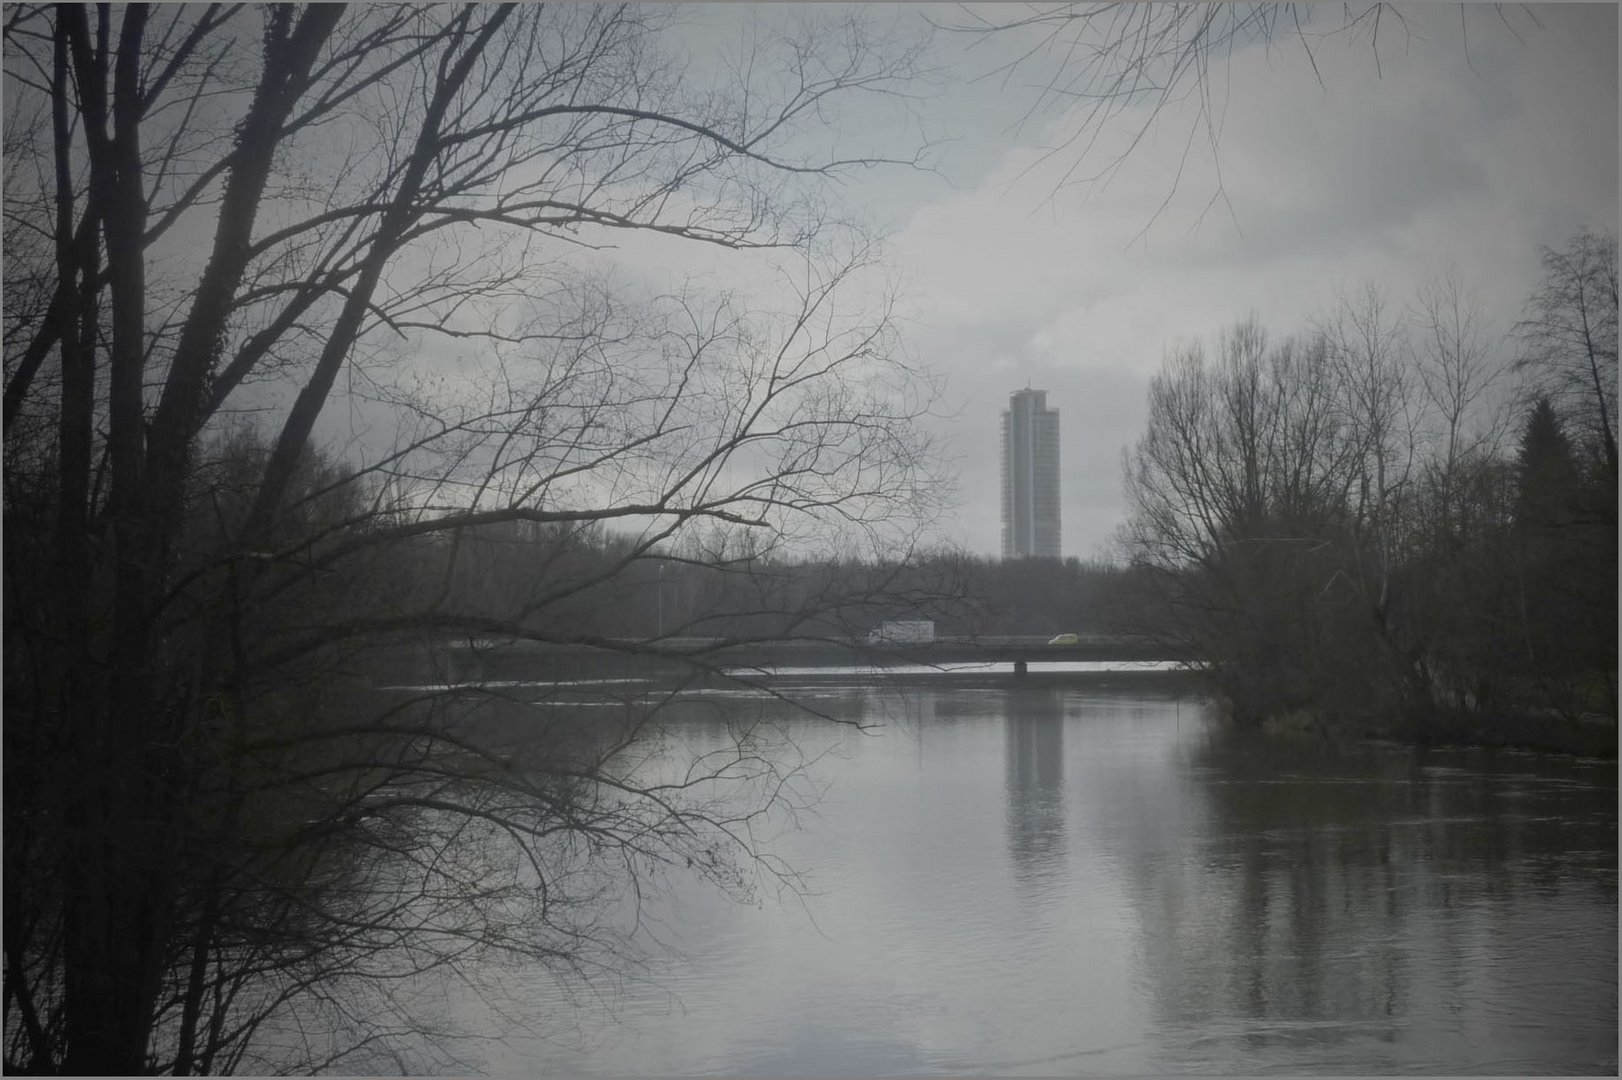 Am Wöhrder See